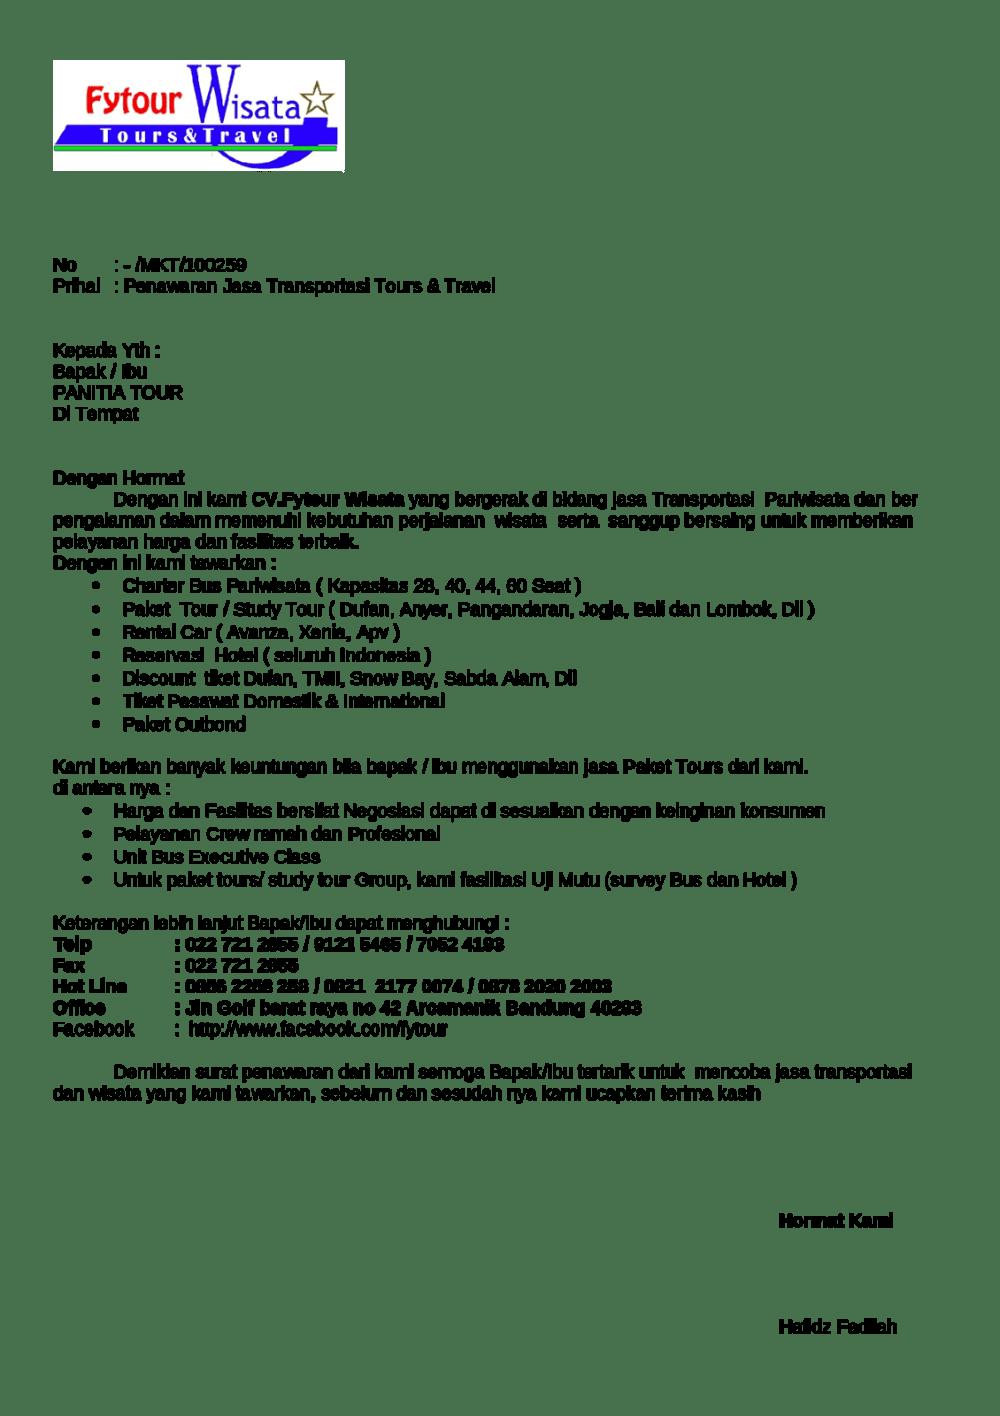 7. Contoh Surat Penawaran Jasa Transportasi